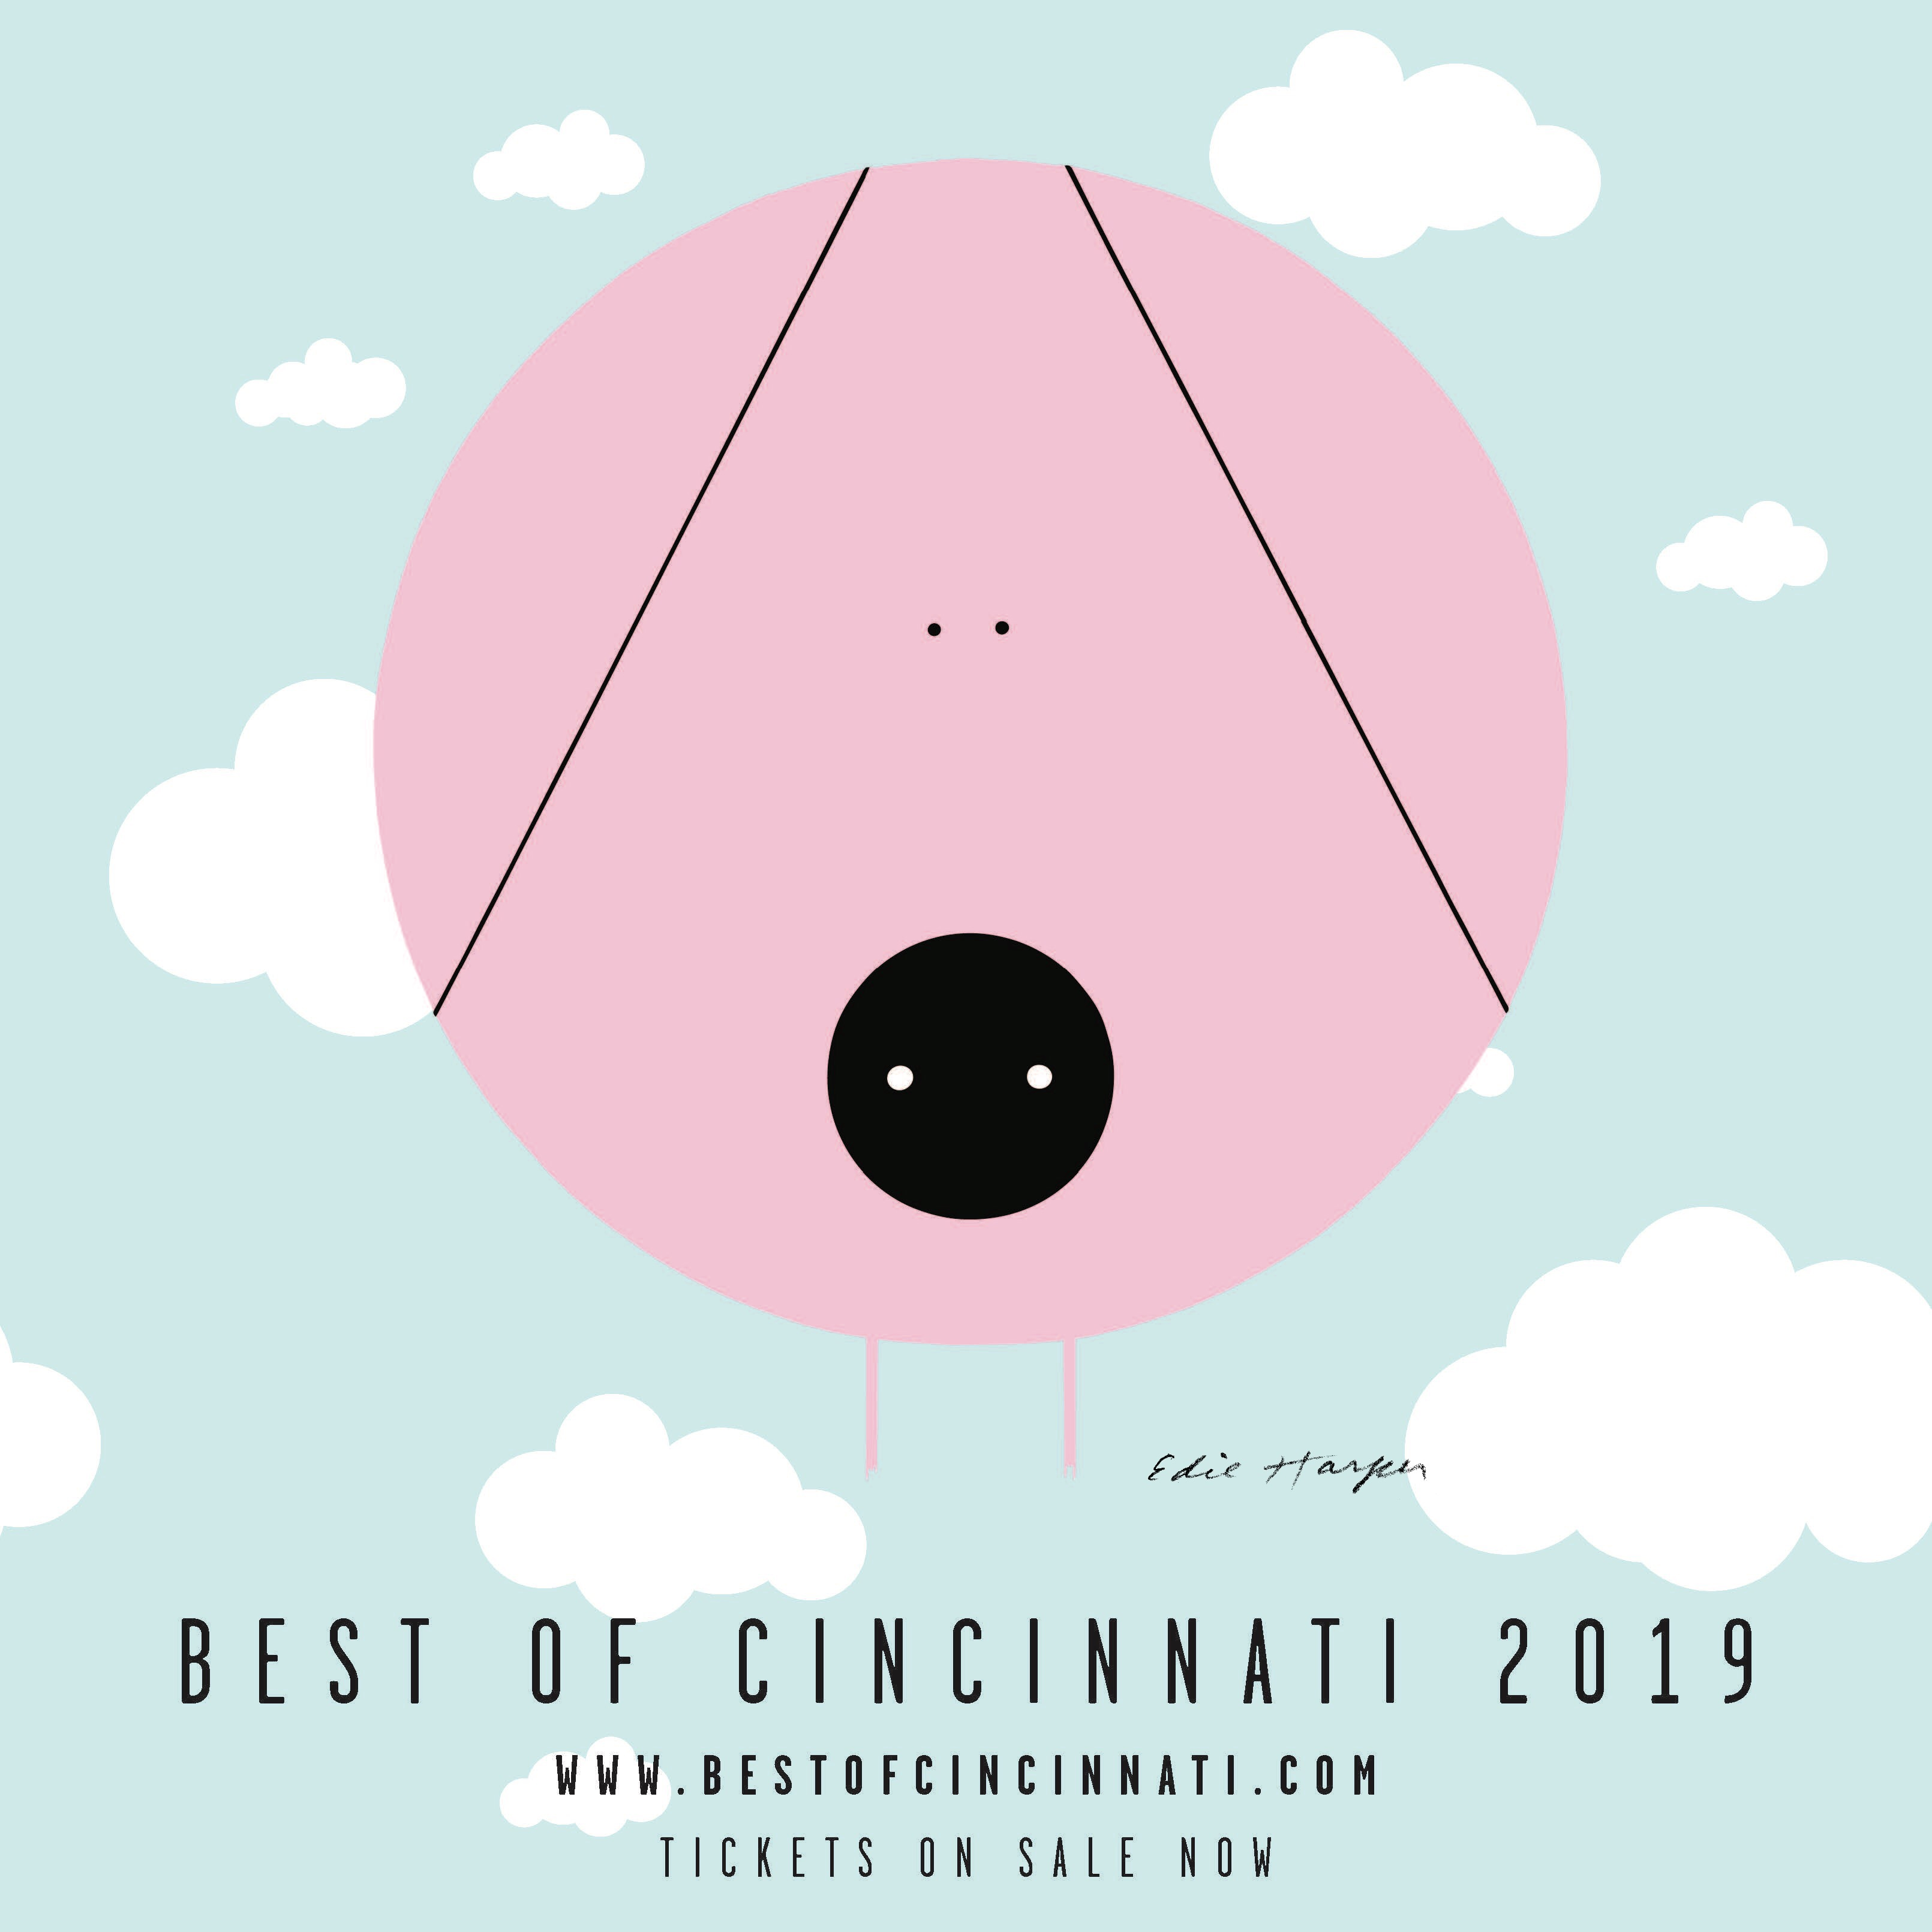 best of cincinnati 2019 tickets the phoenix cincinnati oh wed